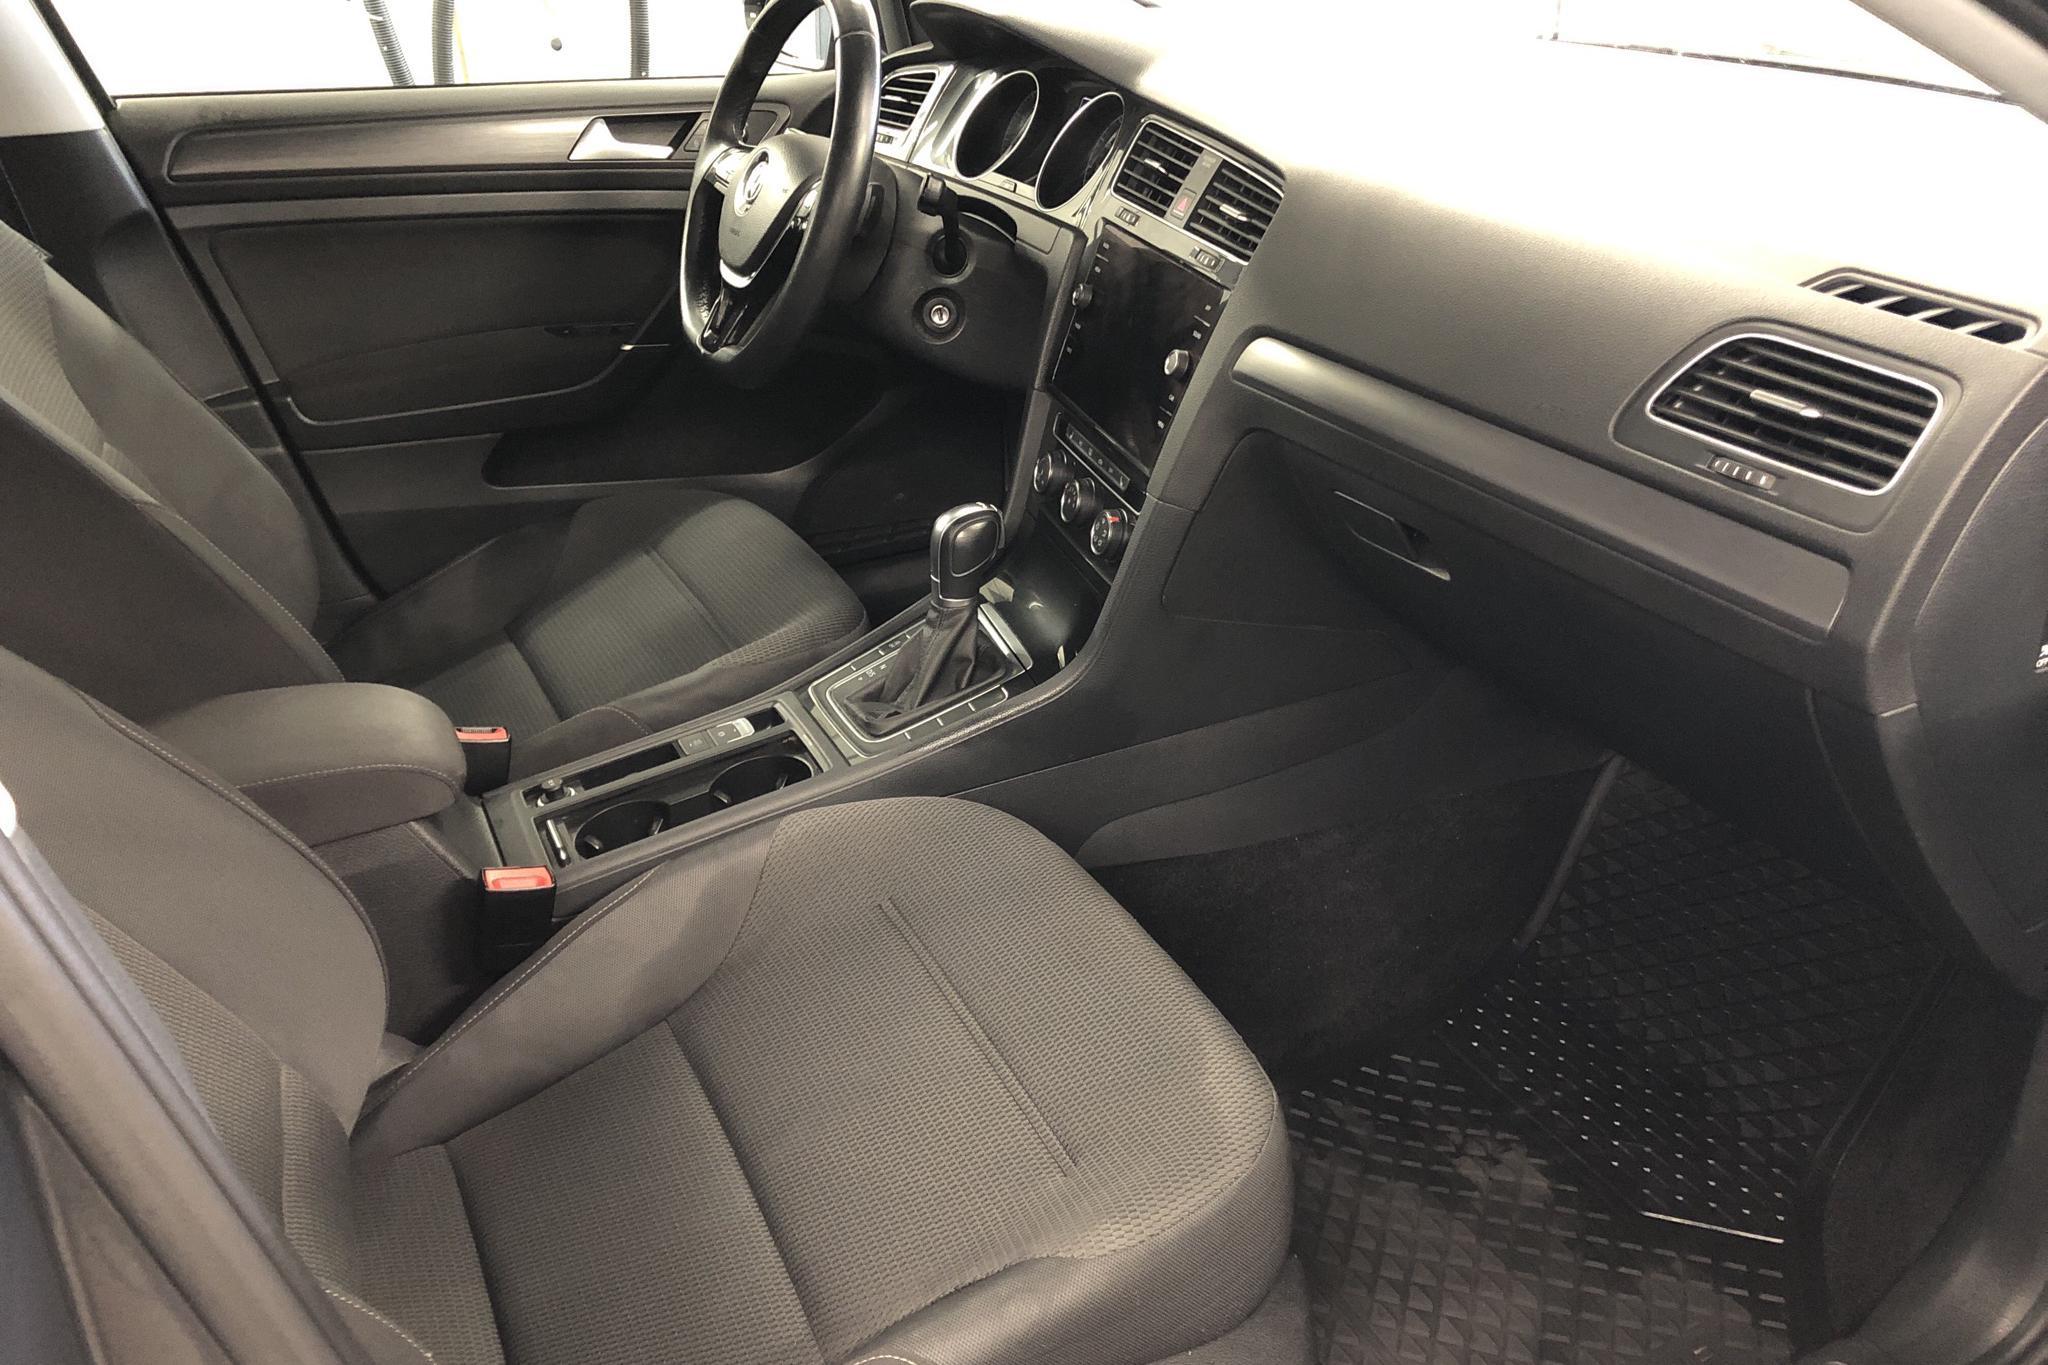 VW Golf VII 1.0 TSI 5dr (110hk) - 3 773 mil - Automat - Dark Grey - 2018